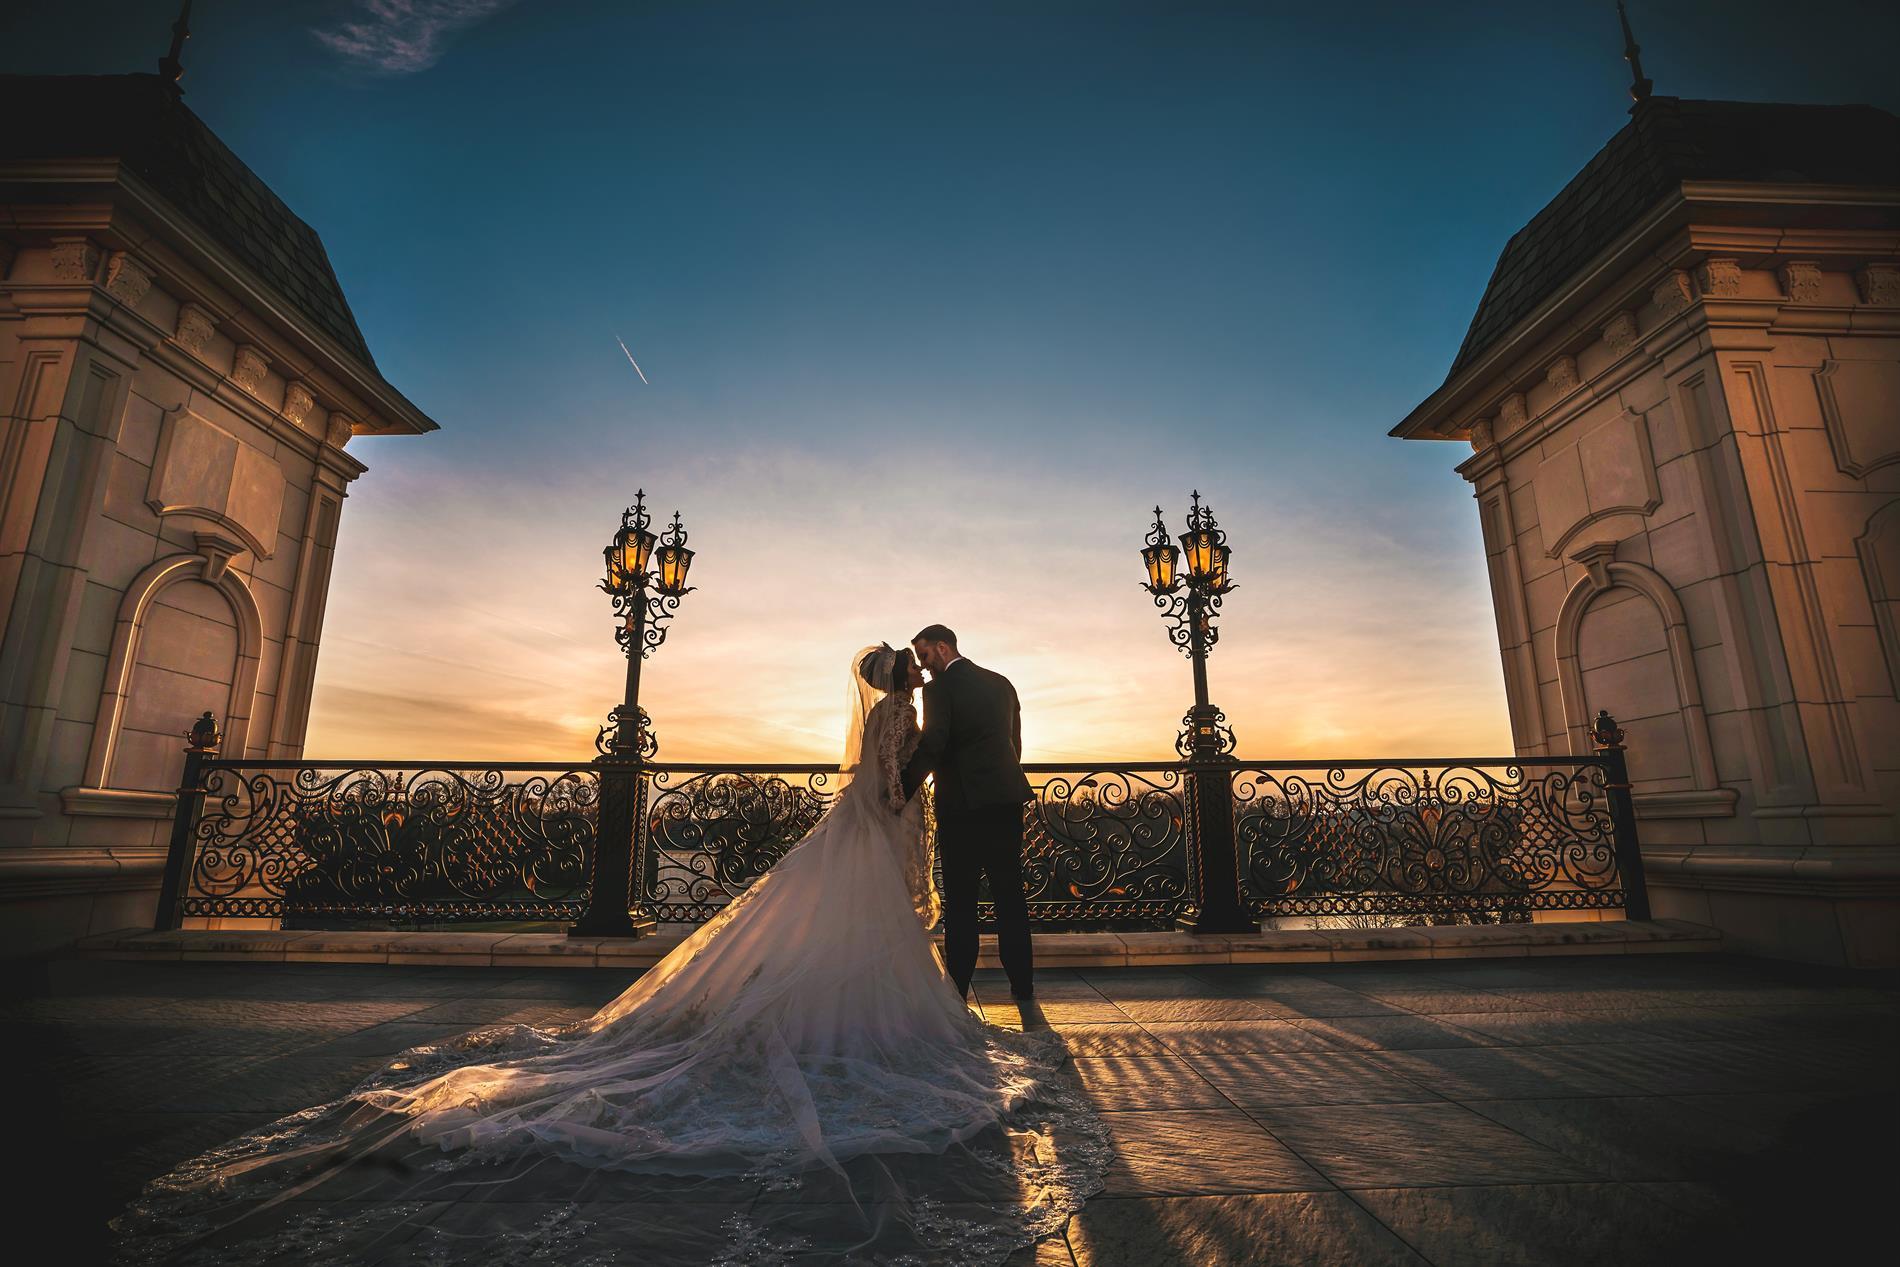 Aleksandr Villamariona Wedding and Engagement Portfolio